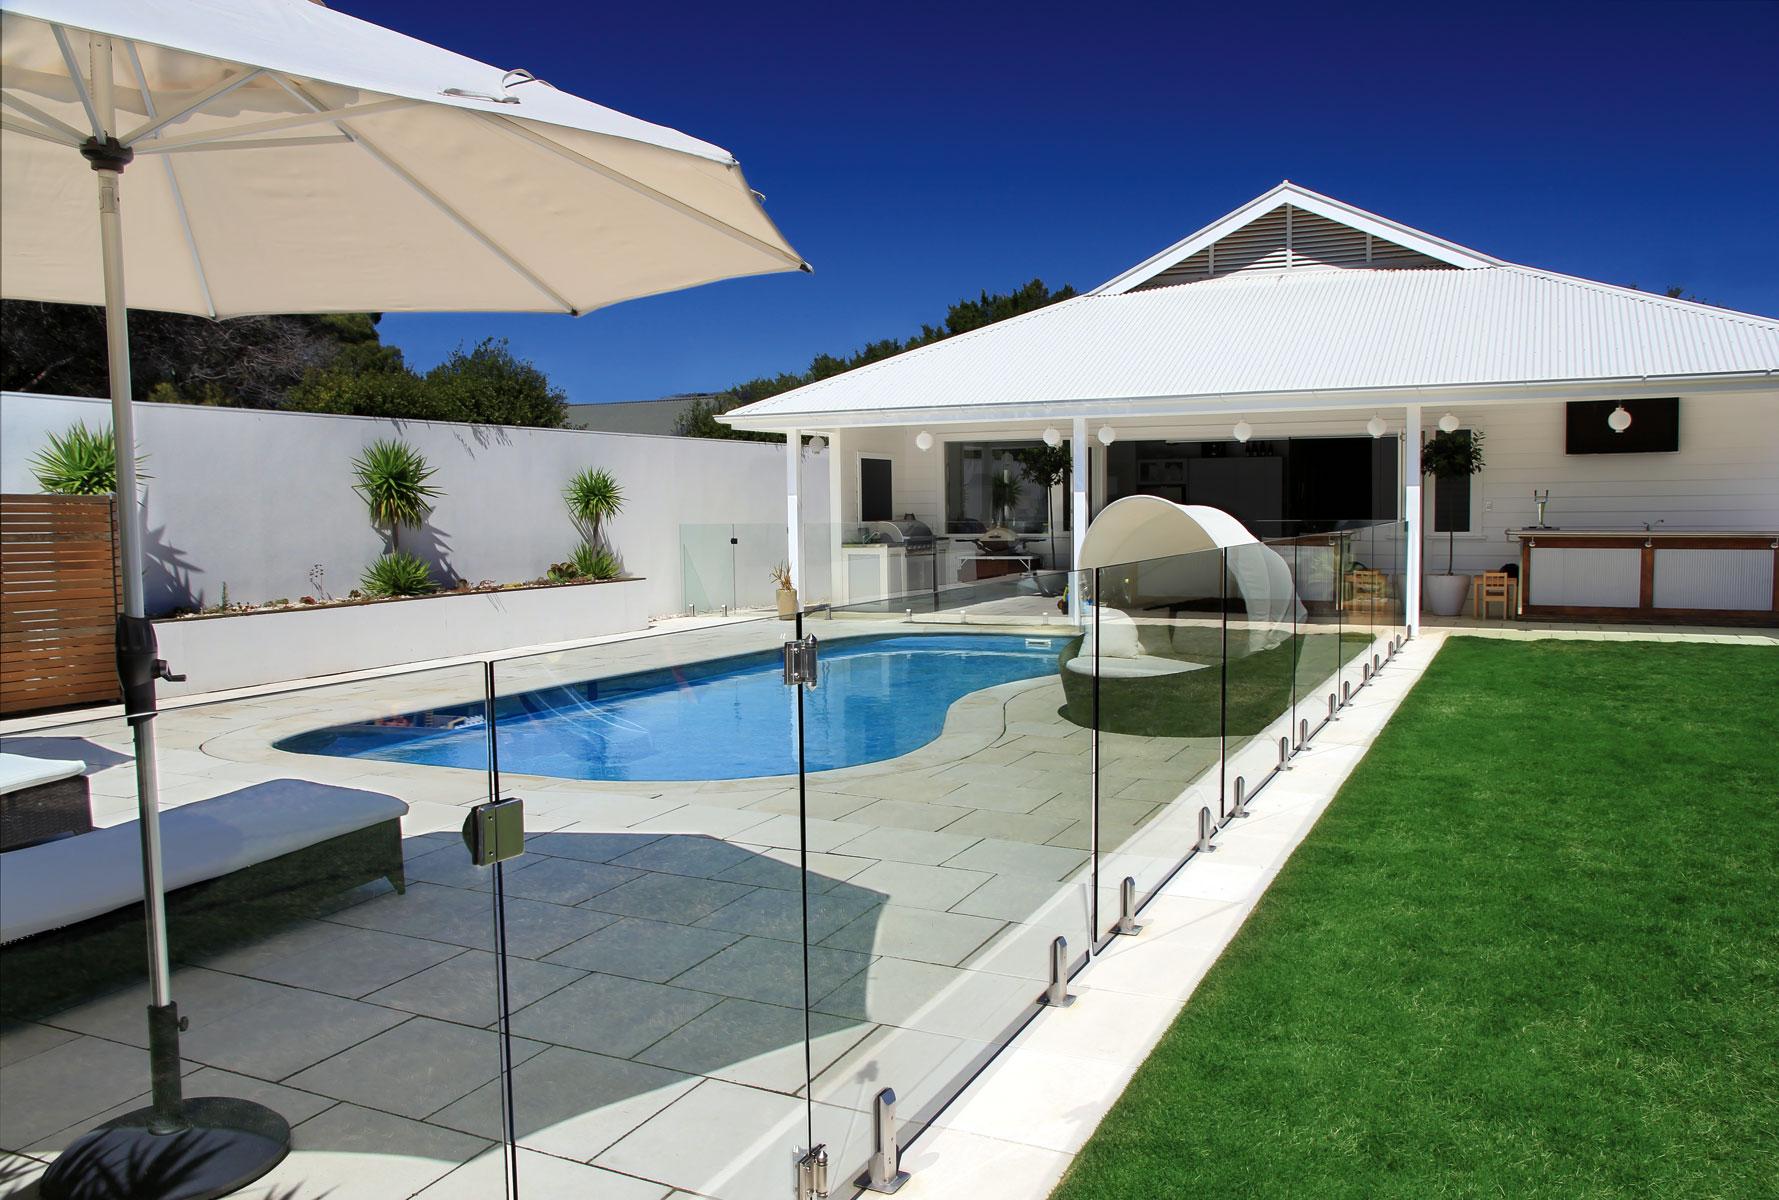 decoracion-barandillas-vidrio-piscina